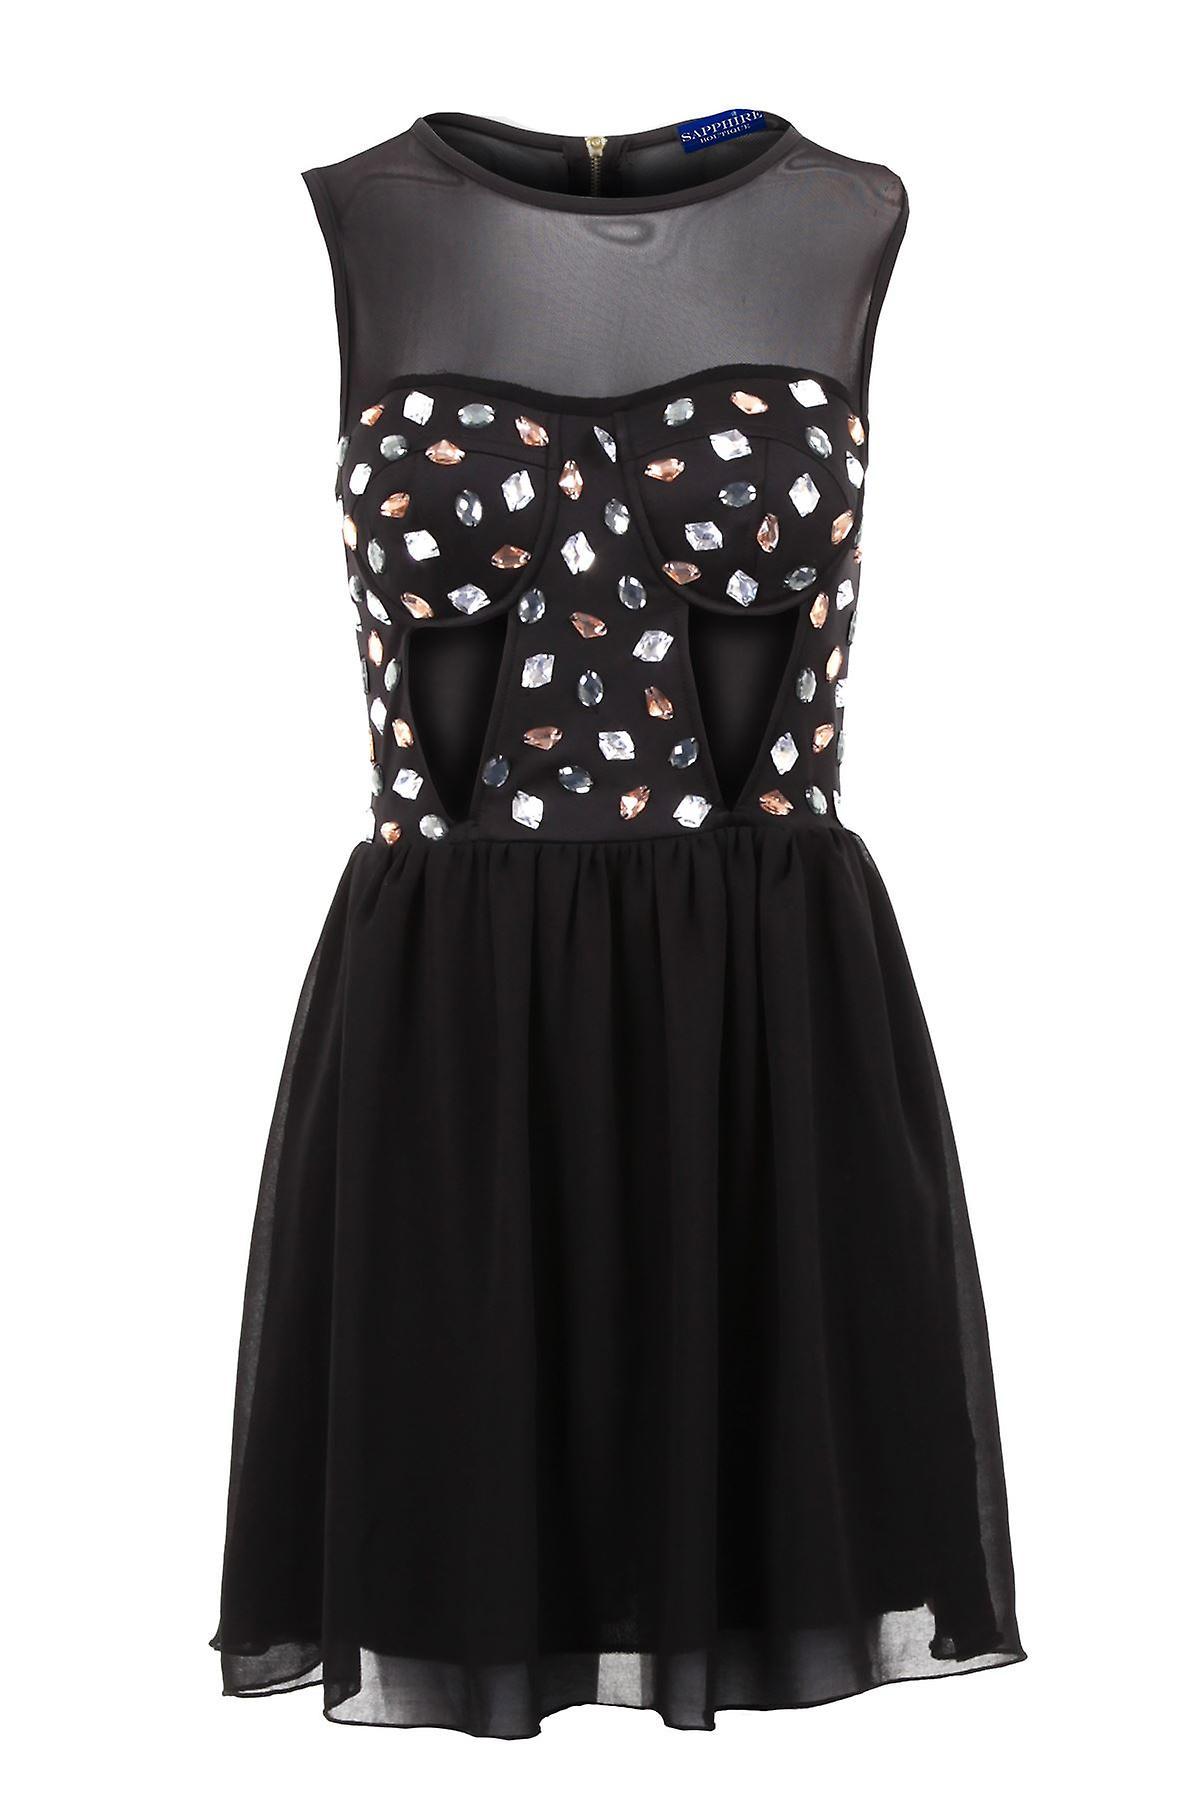 Ladies Mesh Insert Padded Bra Cut Out Jewels Short Chiffon Skirt Women's Dress